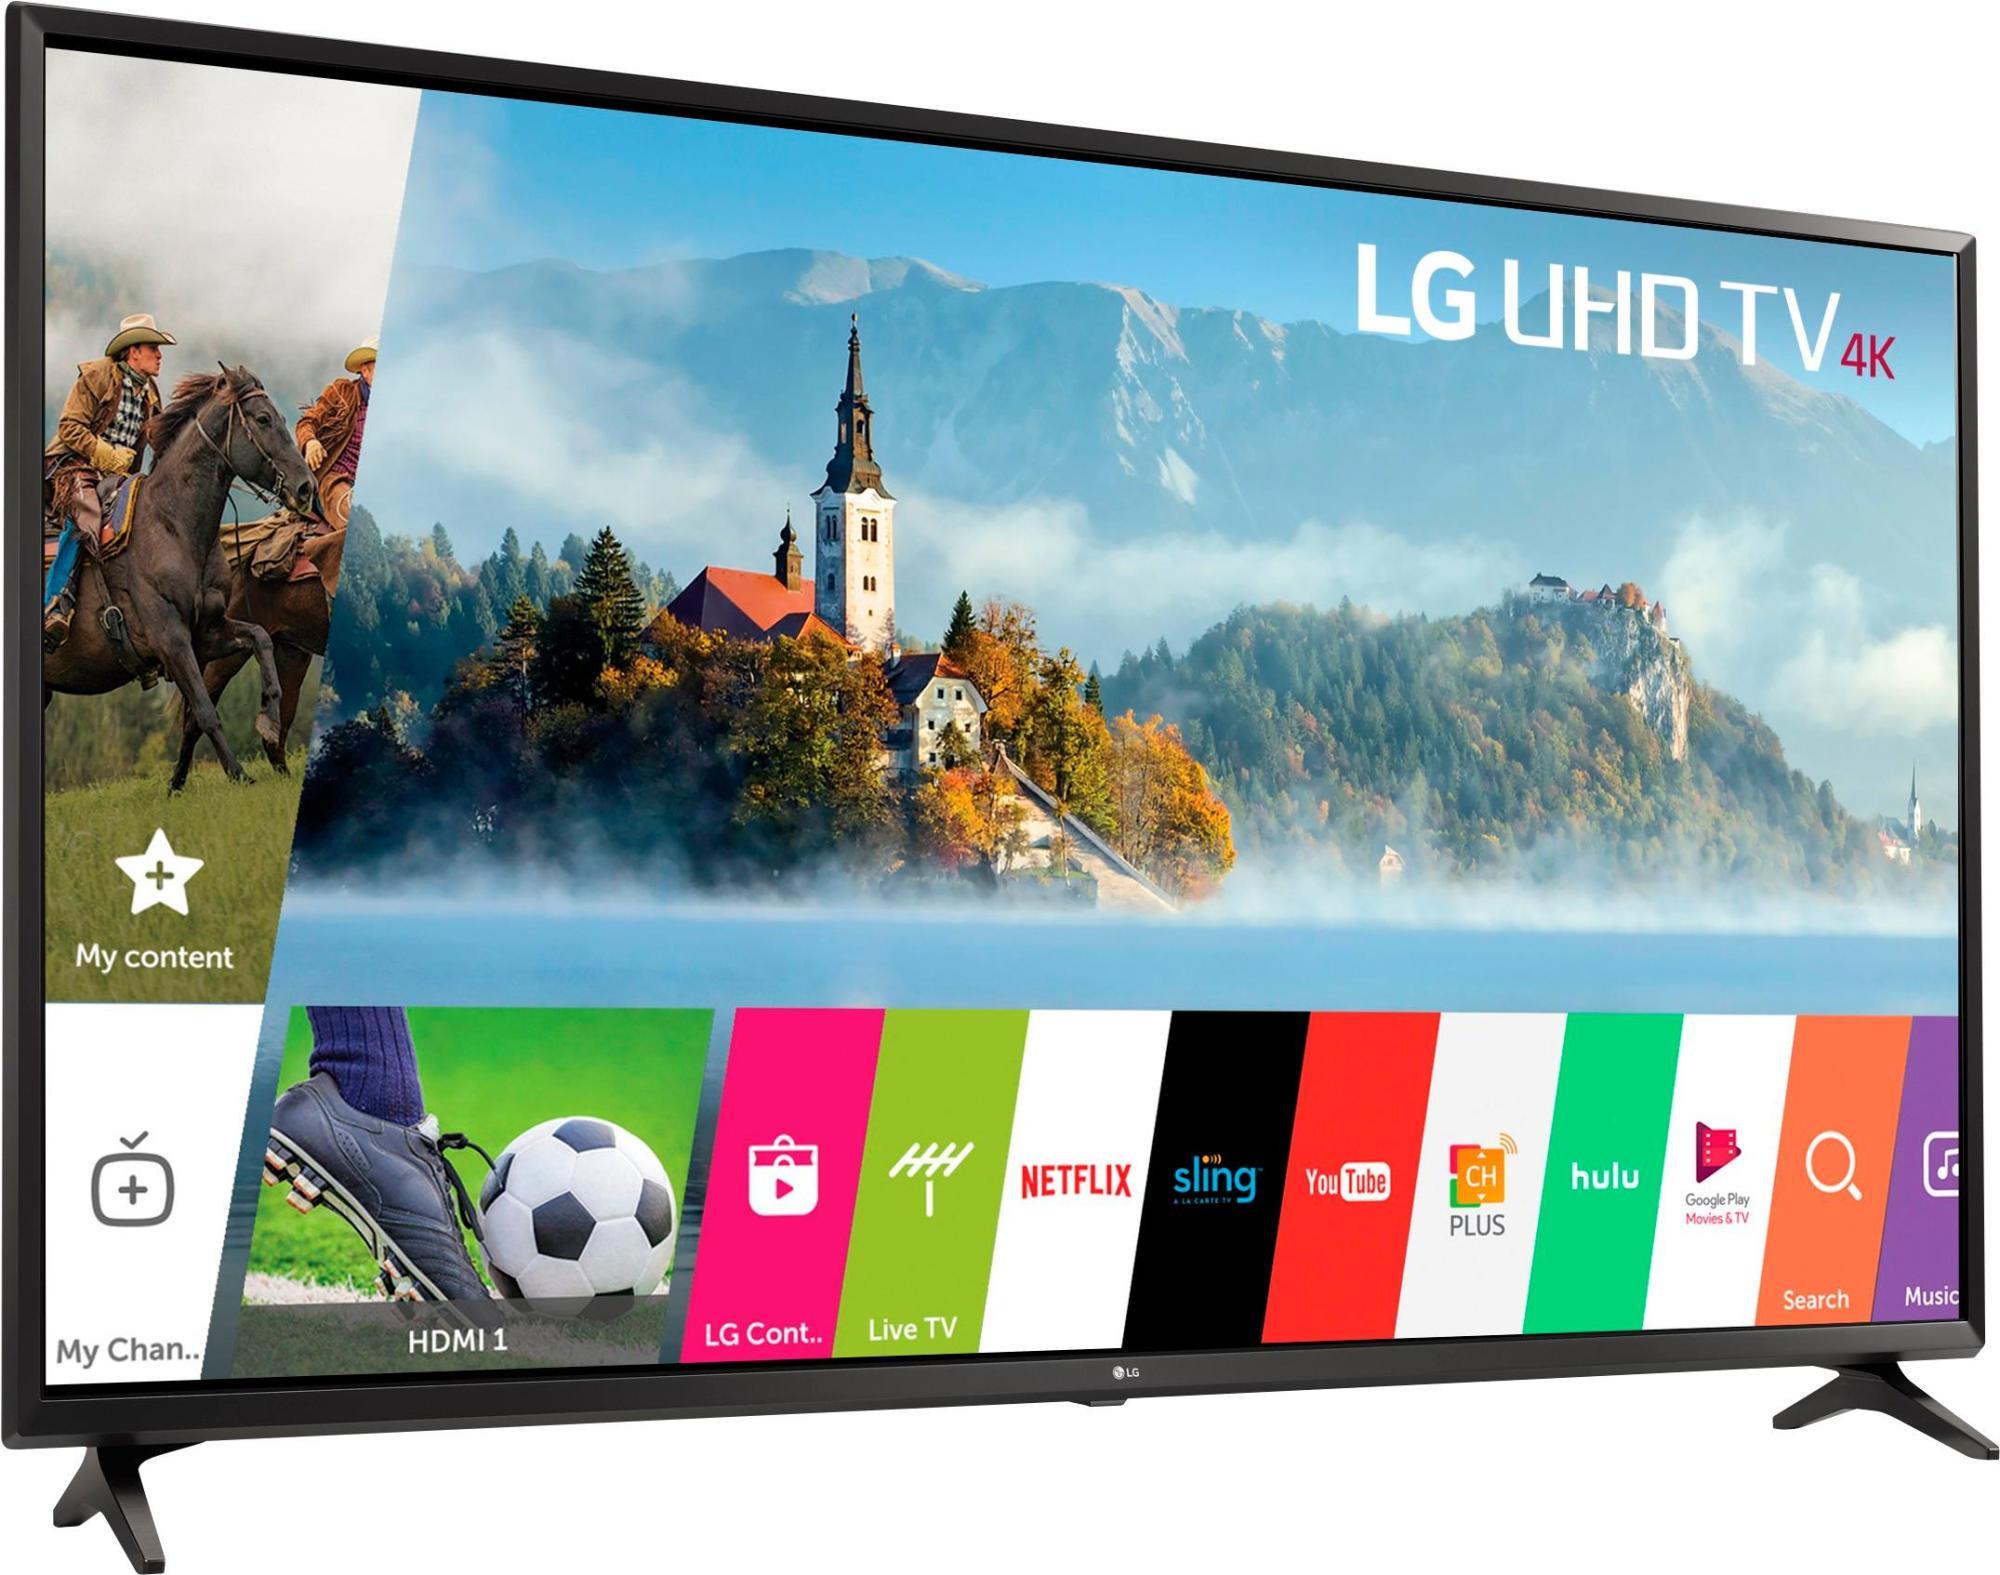 hight resolution of best buy lg 49 class led uj6300 series 2160p smart 4k uhd tv with hdr 49uj6300